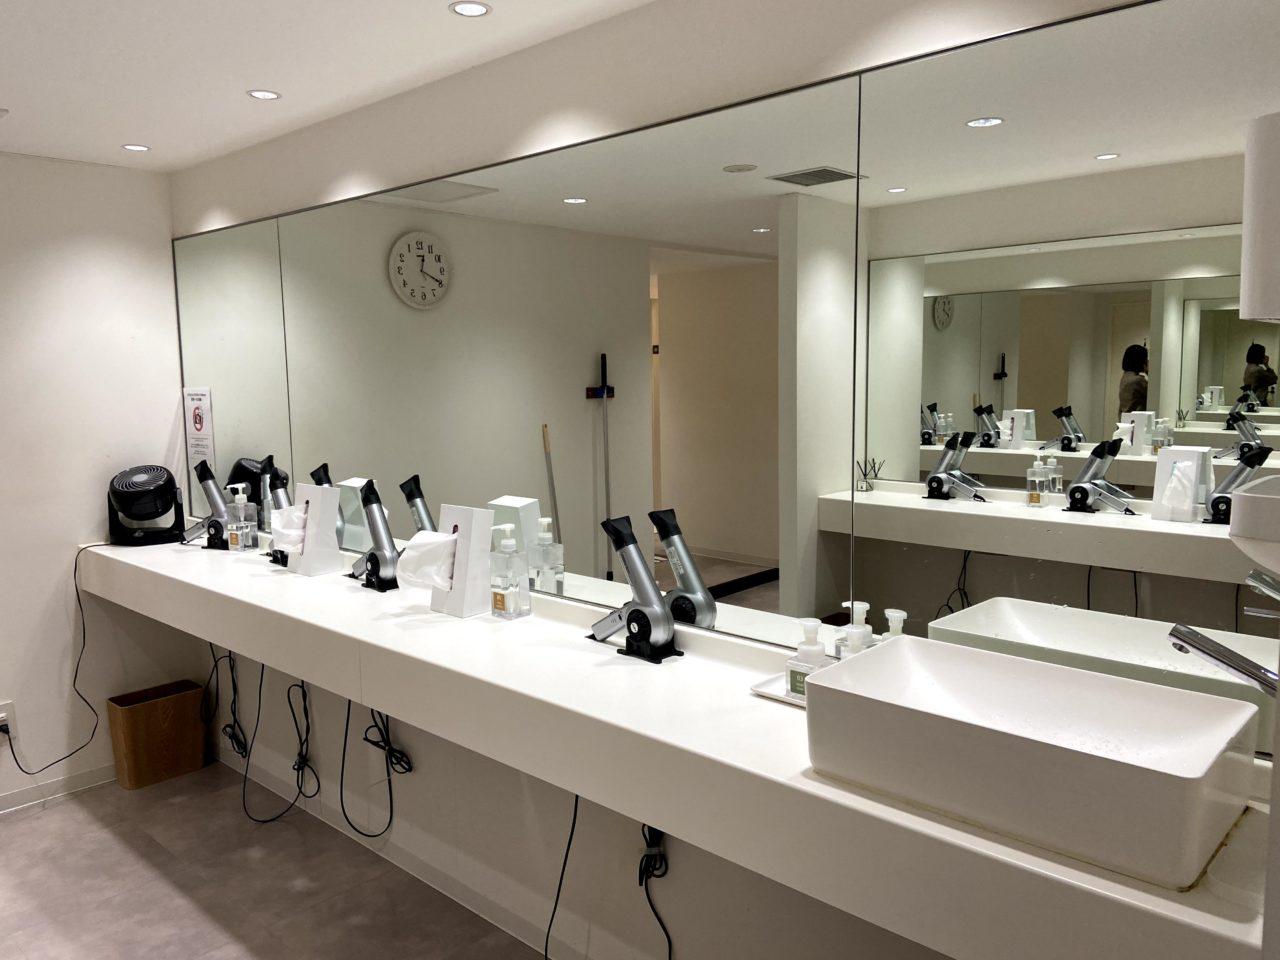 CYCLE STUDIOR渋谷の洗面台